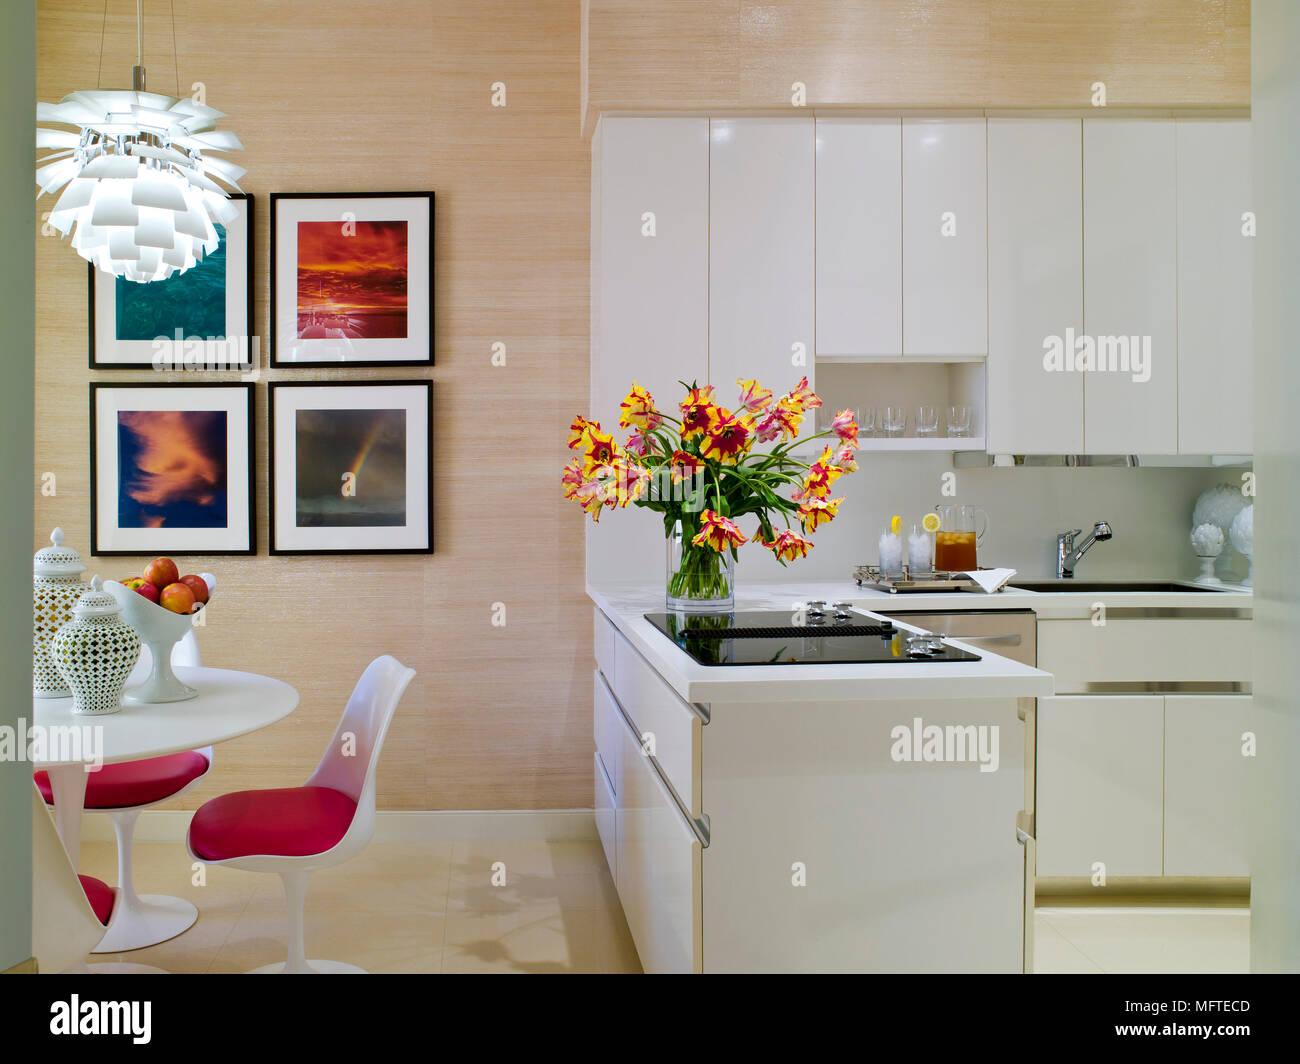 Eero Saarinen Mesa E Cadeiras Na Moderna Cozinha Em Plano Aberto